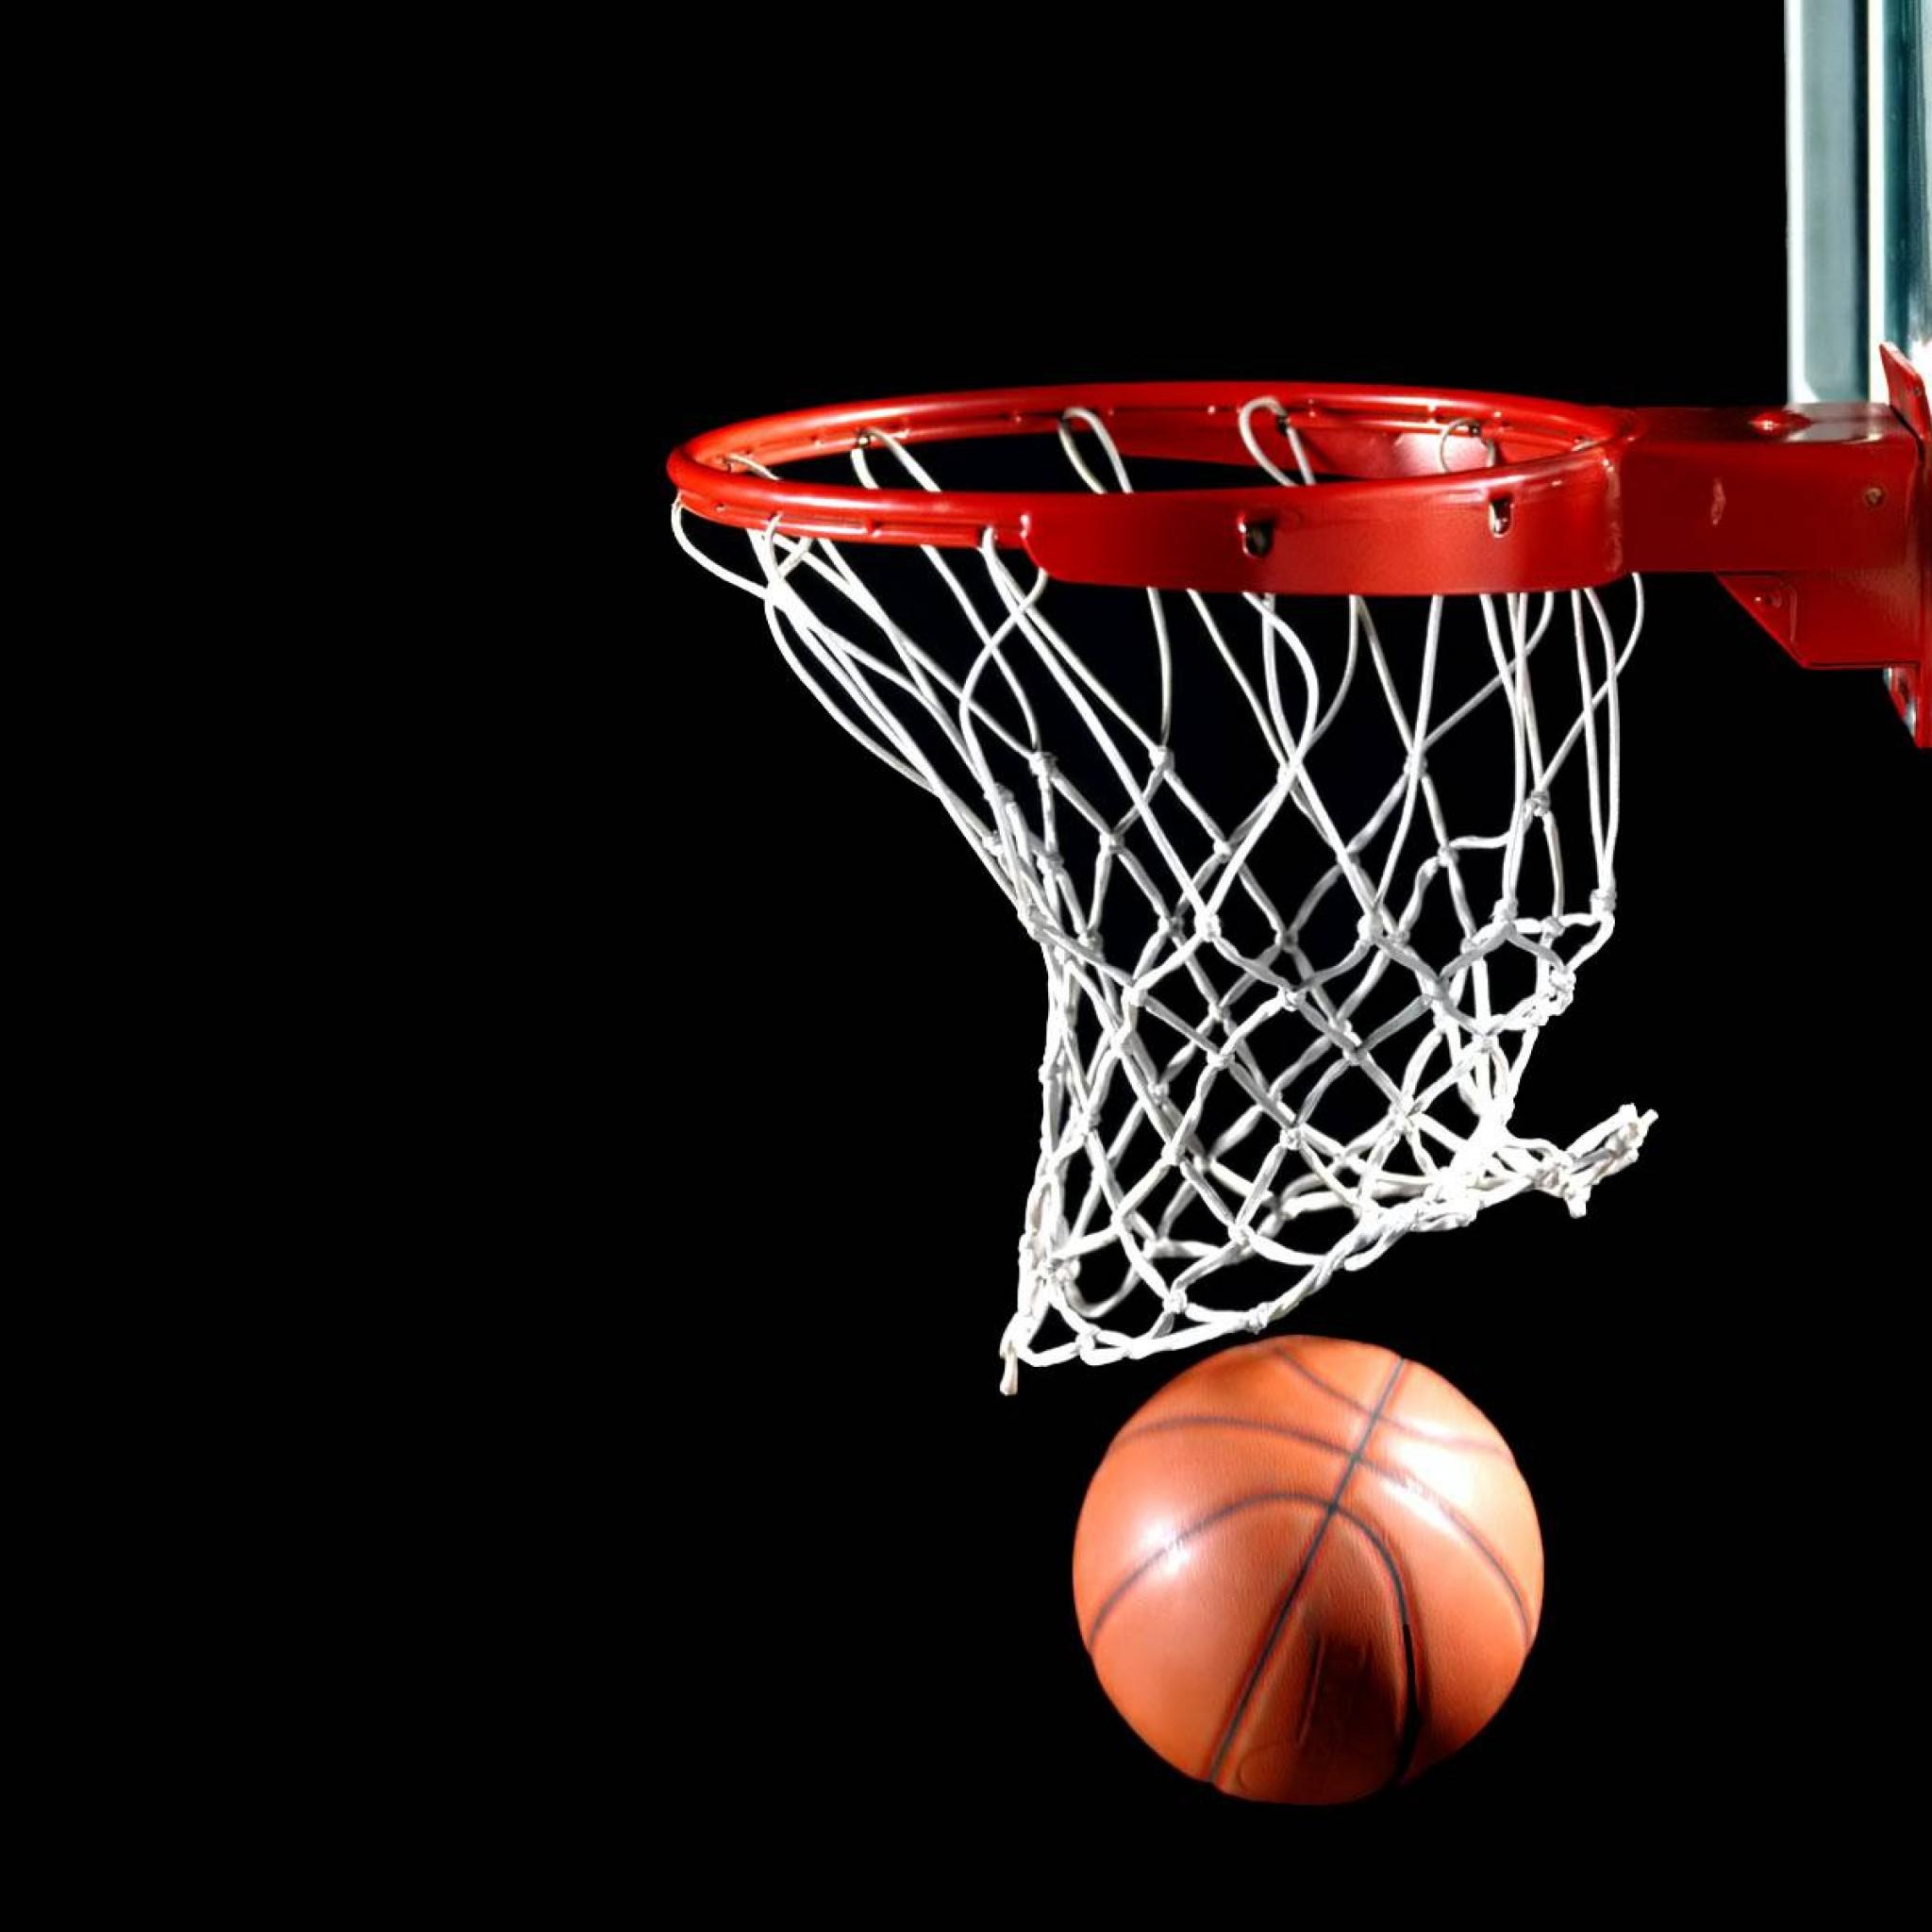 FunMozar Basketball Wallpapers IPhone